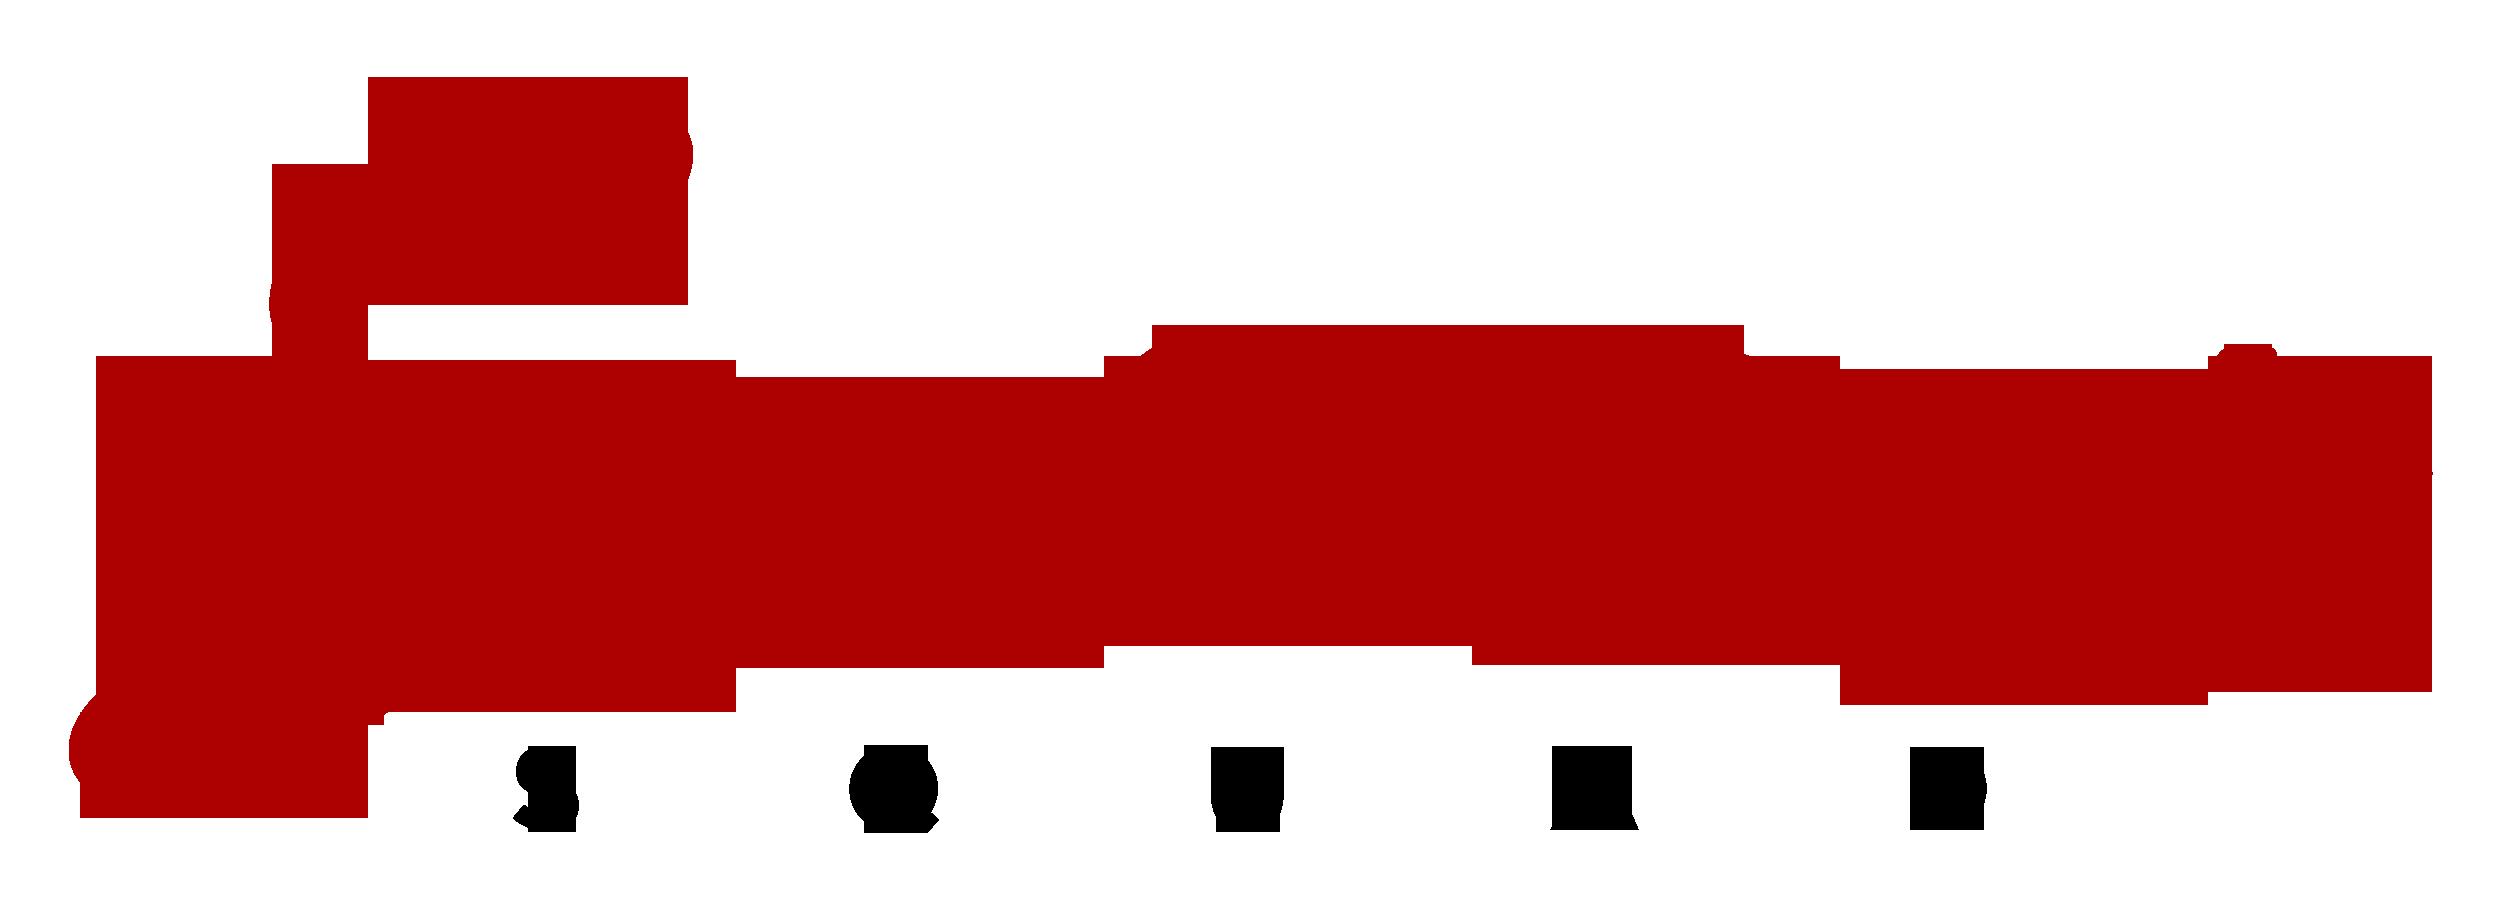 SSLogo_Final_Transparent.png